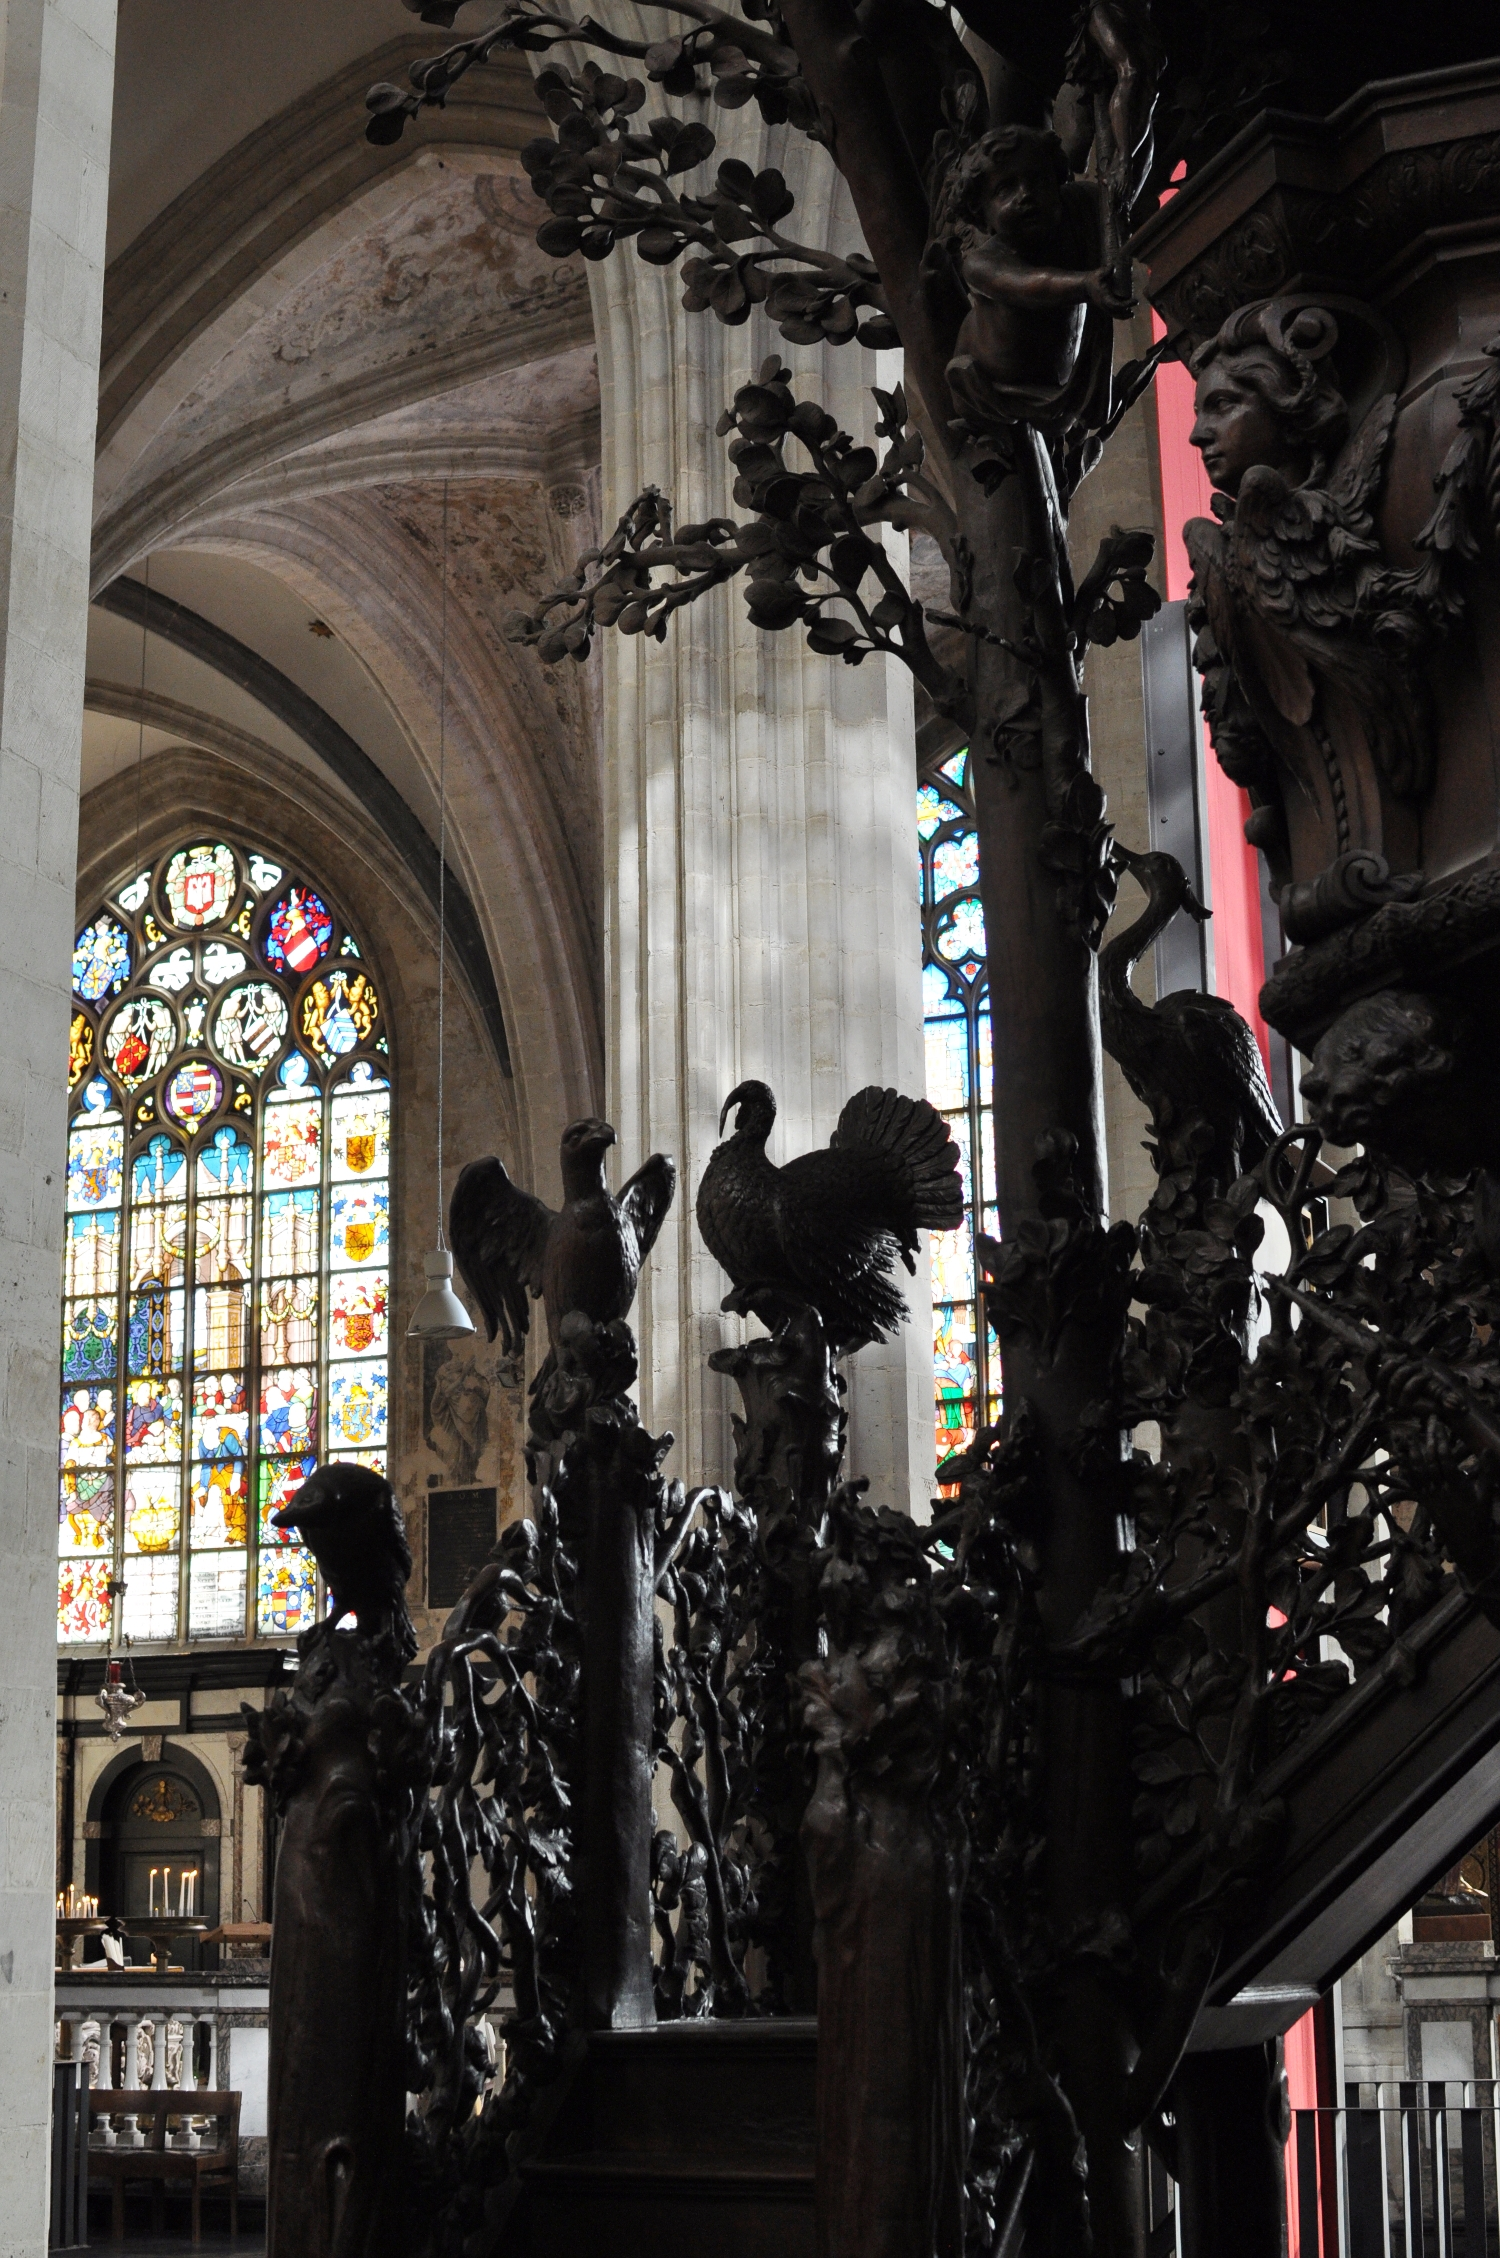 rocaille-blog-cattedrale-anversa-rubens-Onze-Lieve-Vrouwekathedraal-antwerpen-5